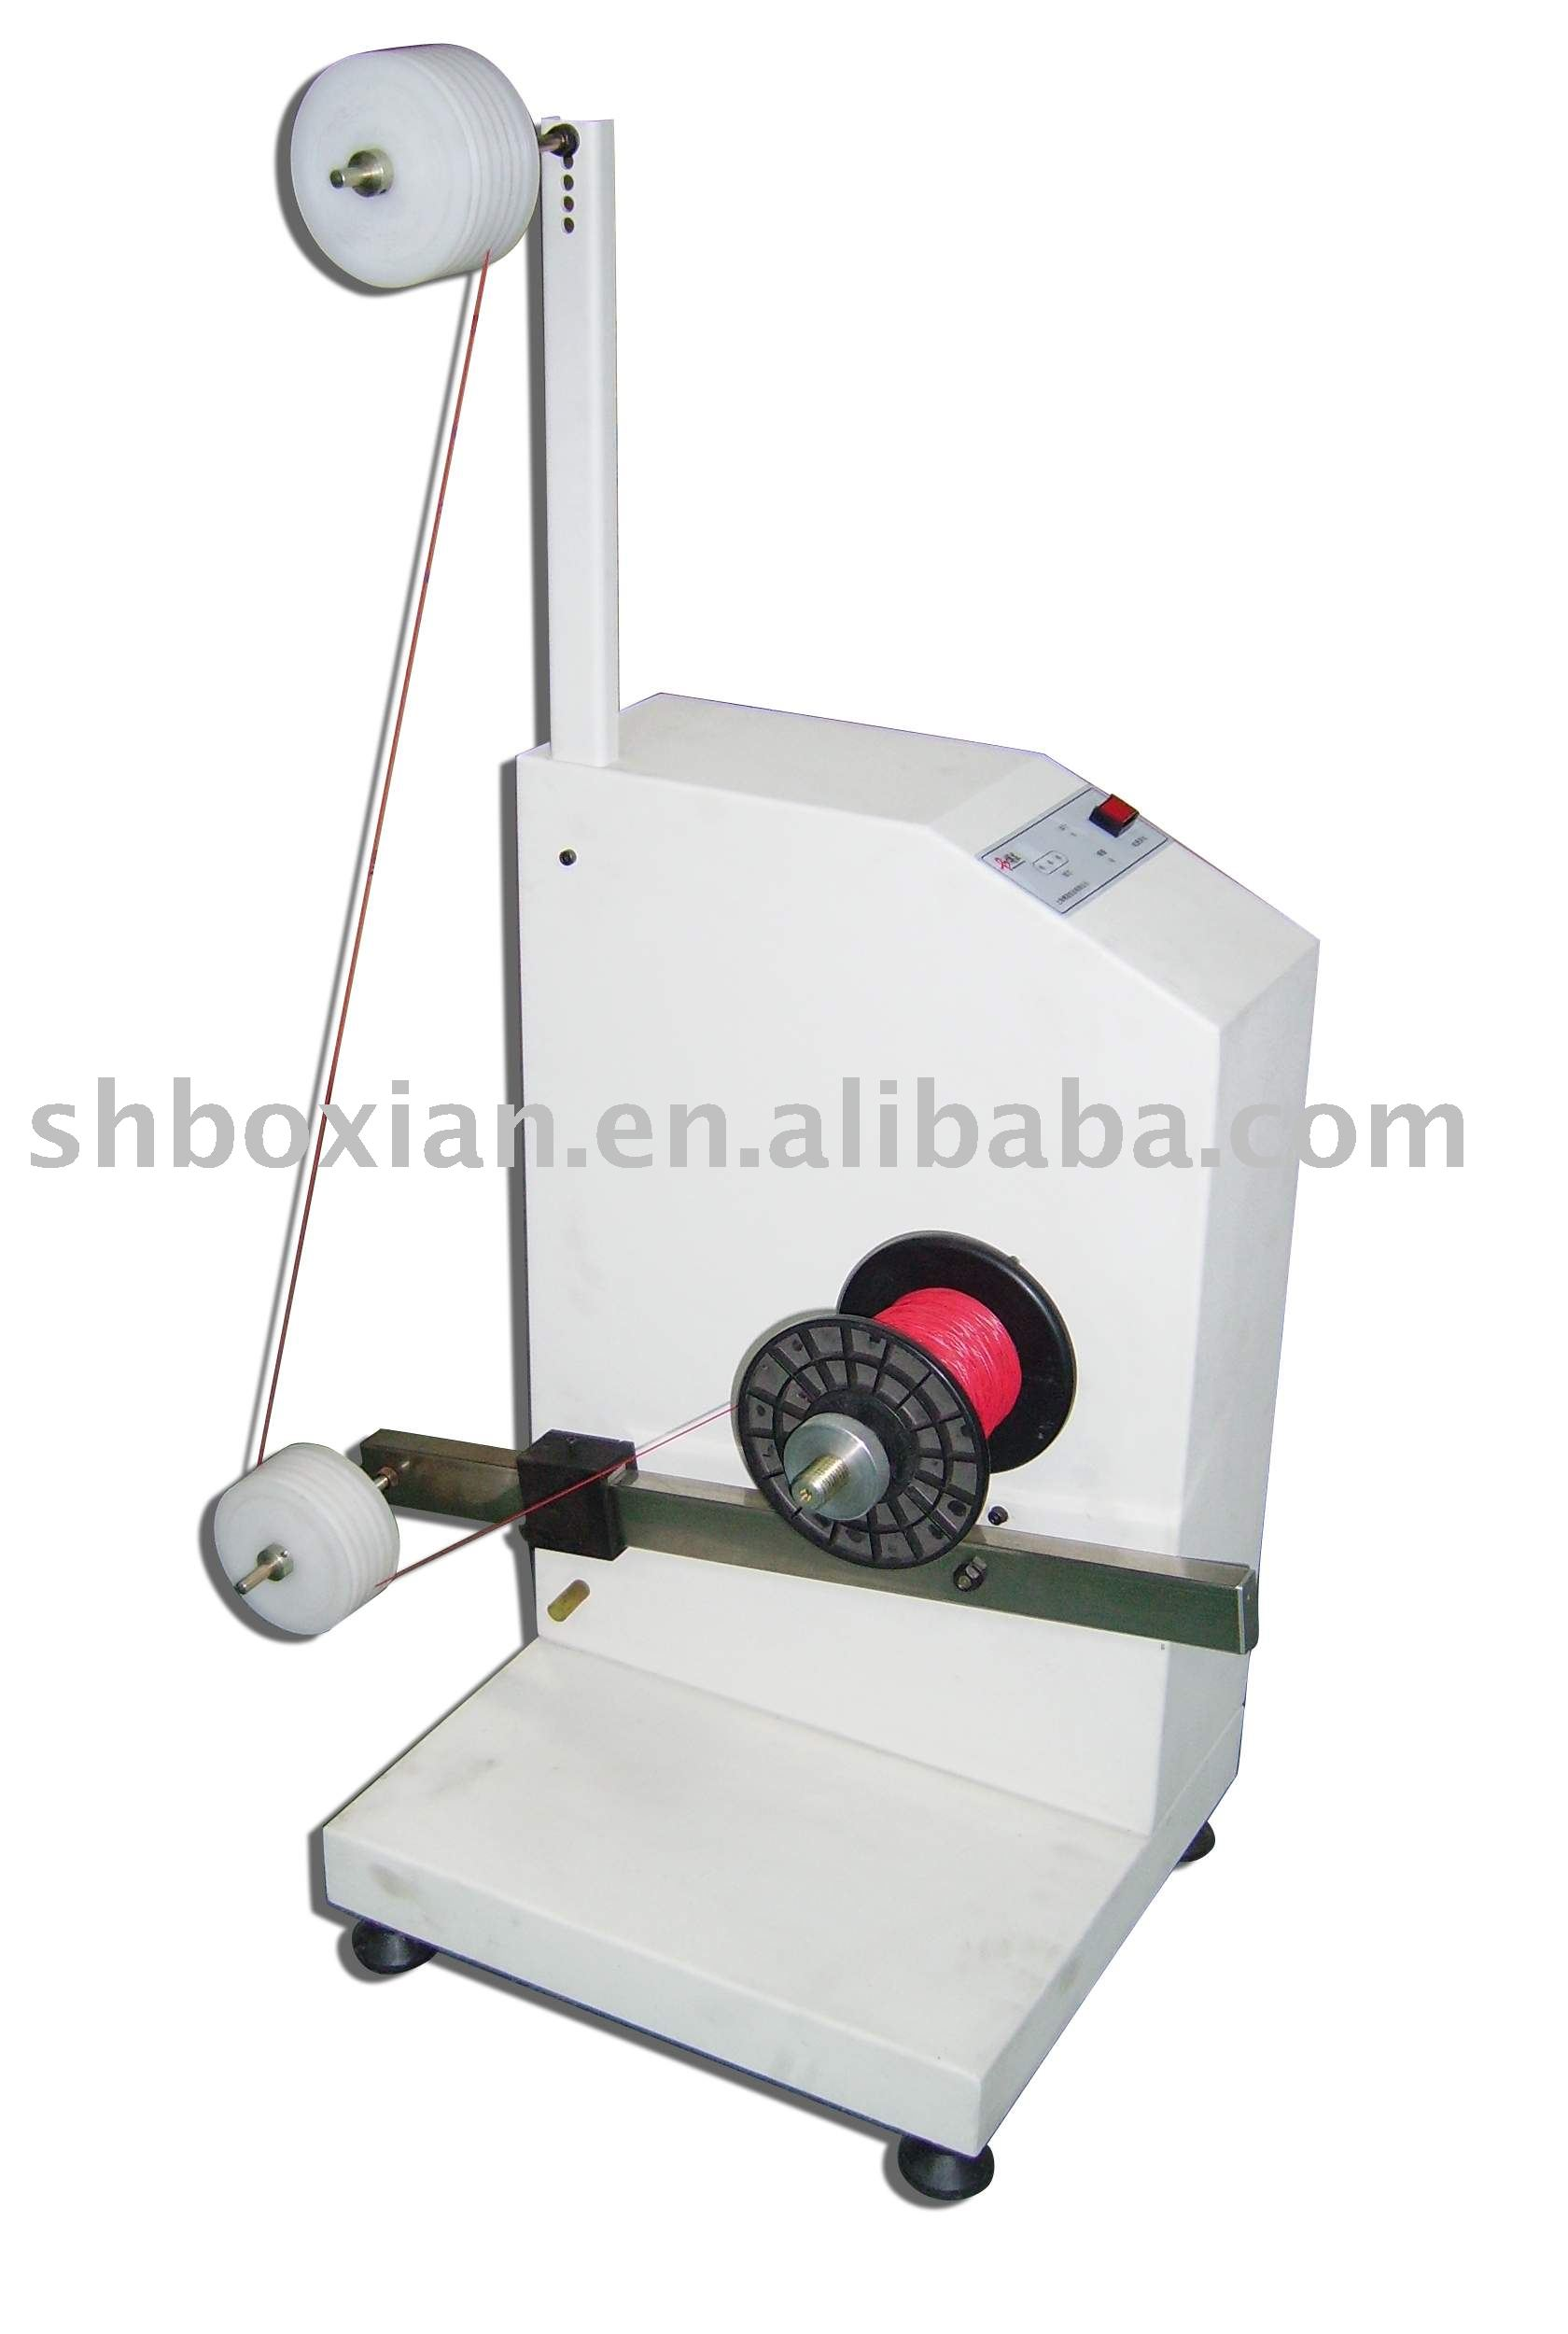 wire stripping and cutting machine